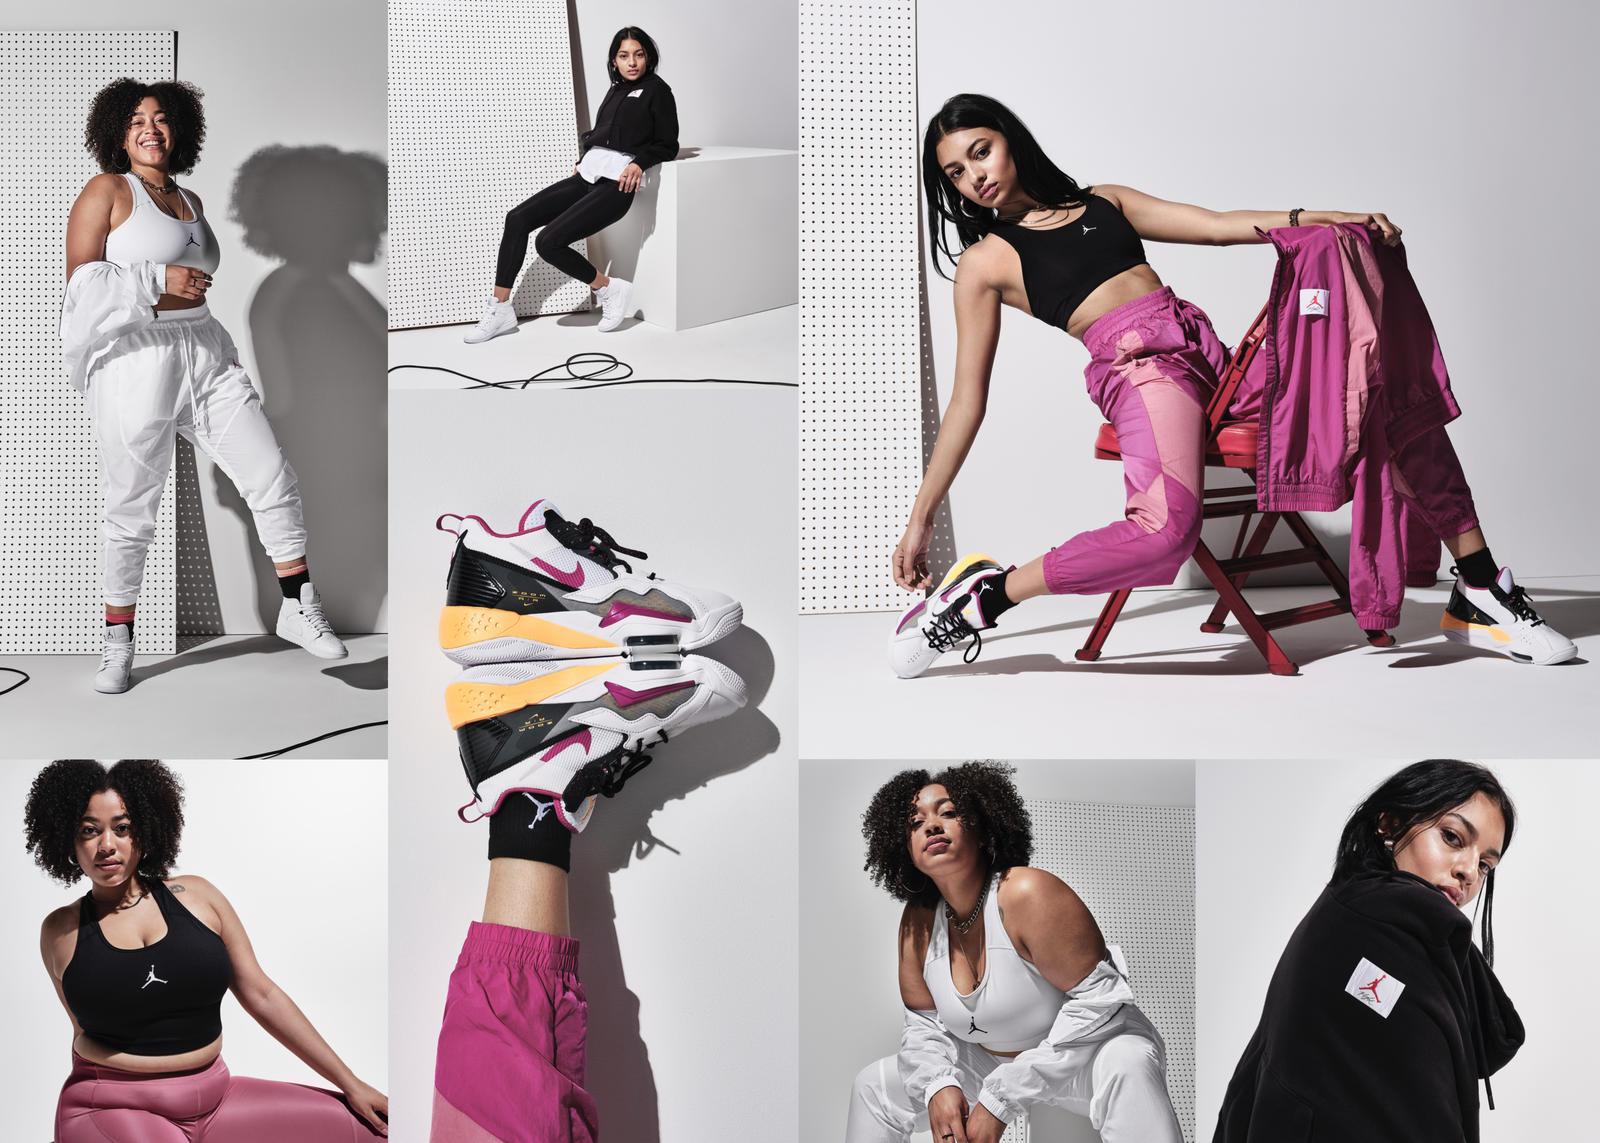 Jordan Brand Reveals Fall 20 Apparel for Women and Men